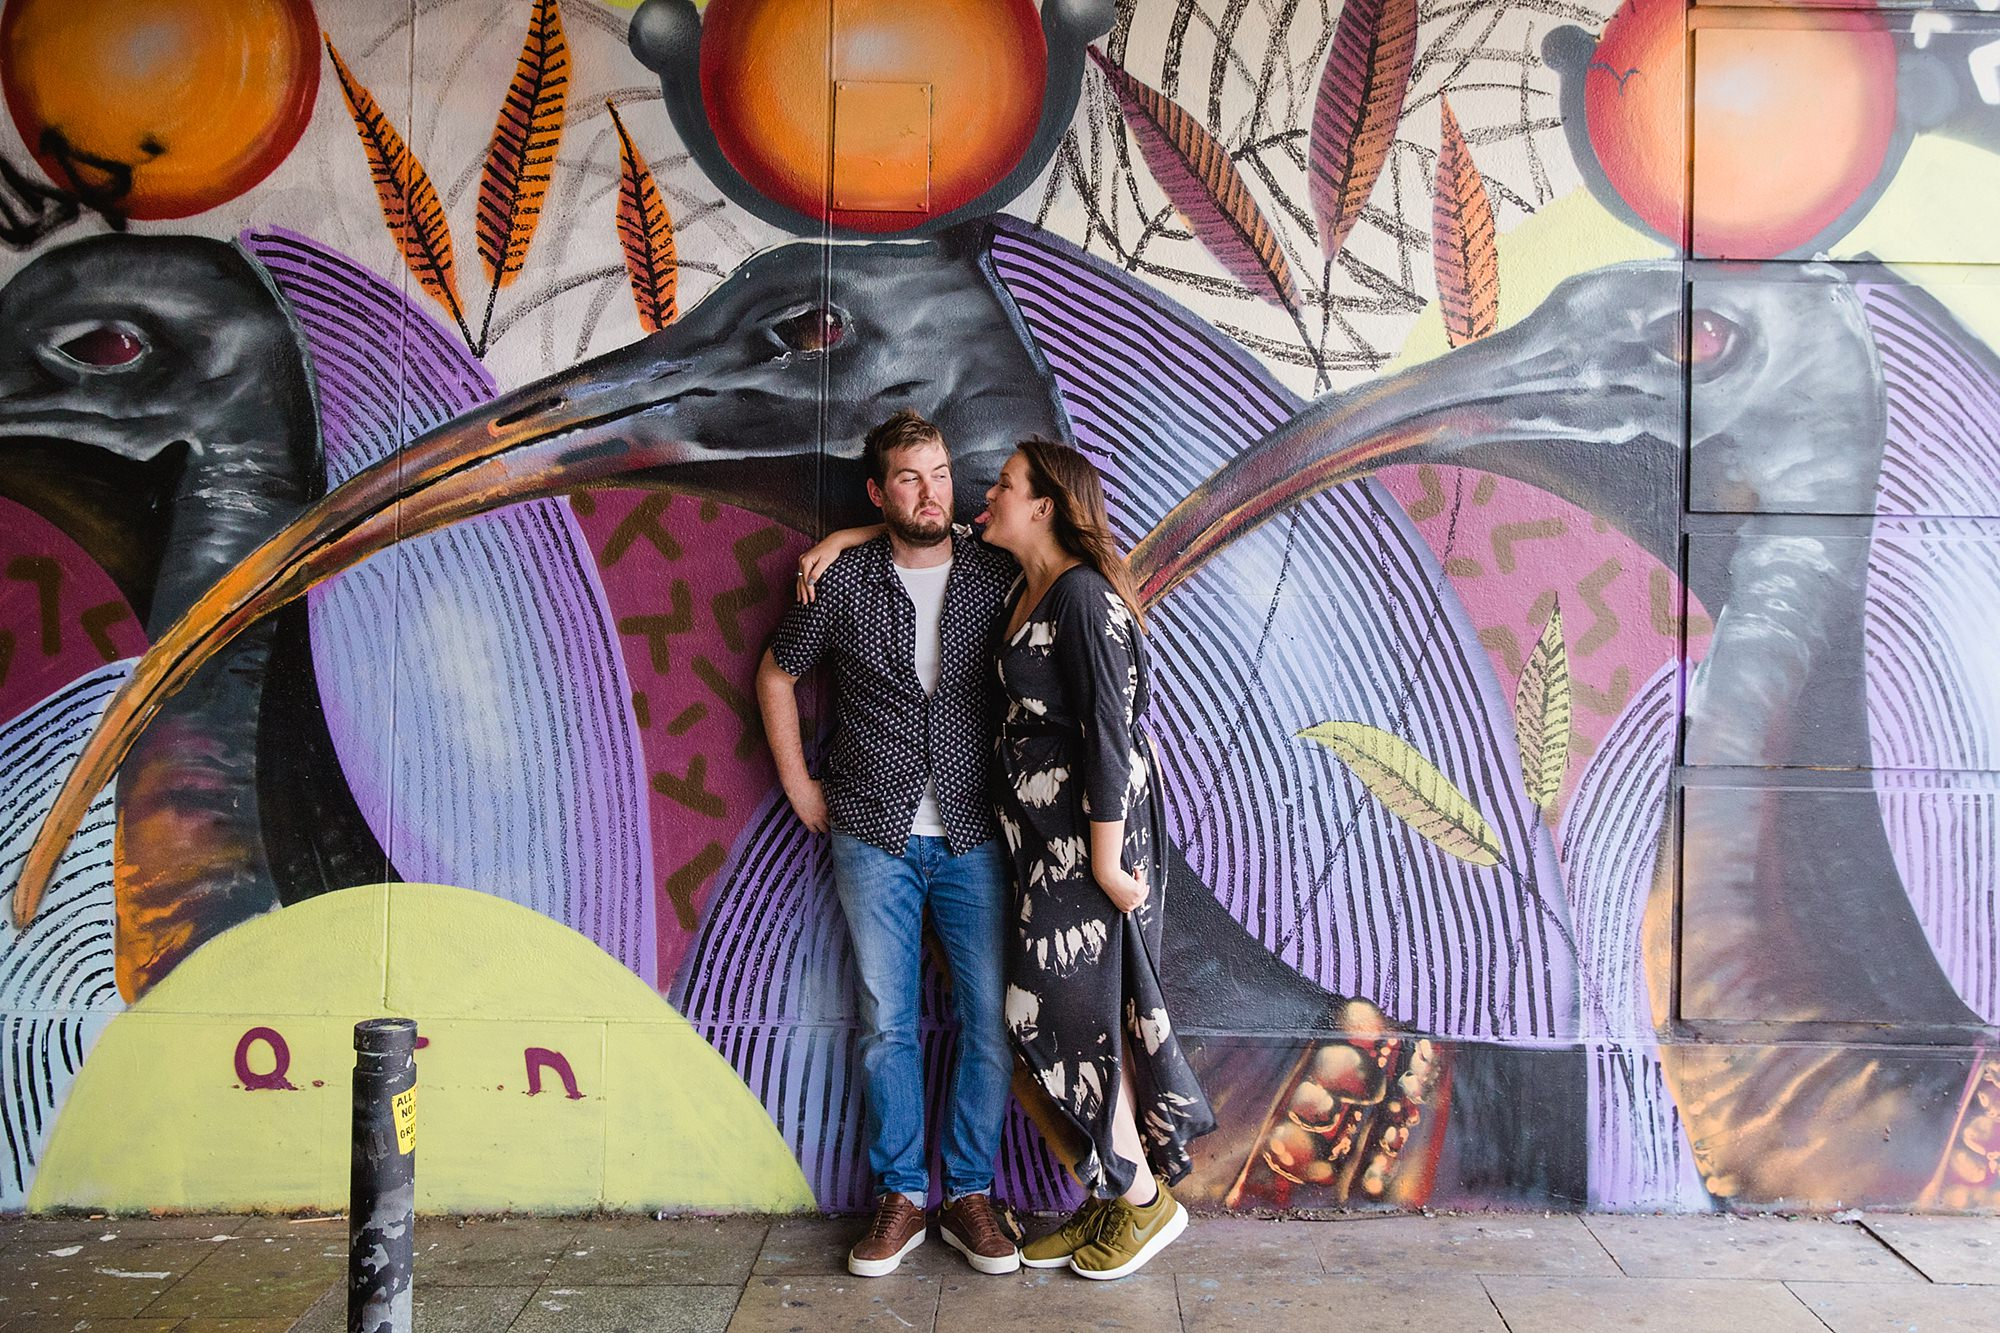 Croydon engagement photography with graffiti